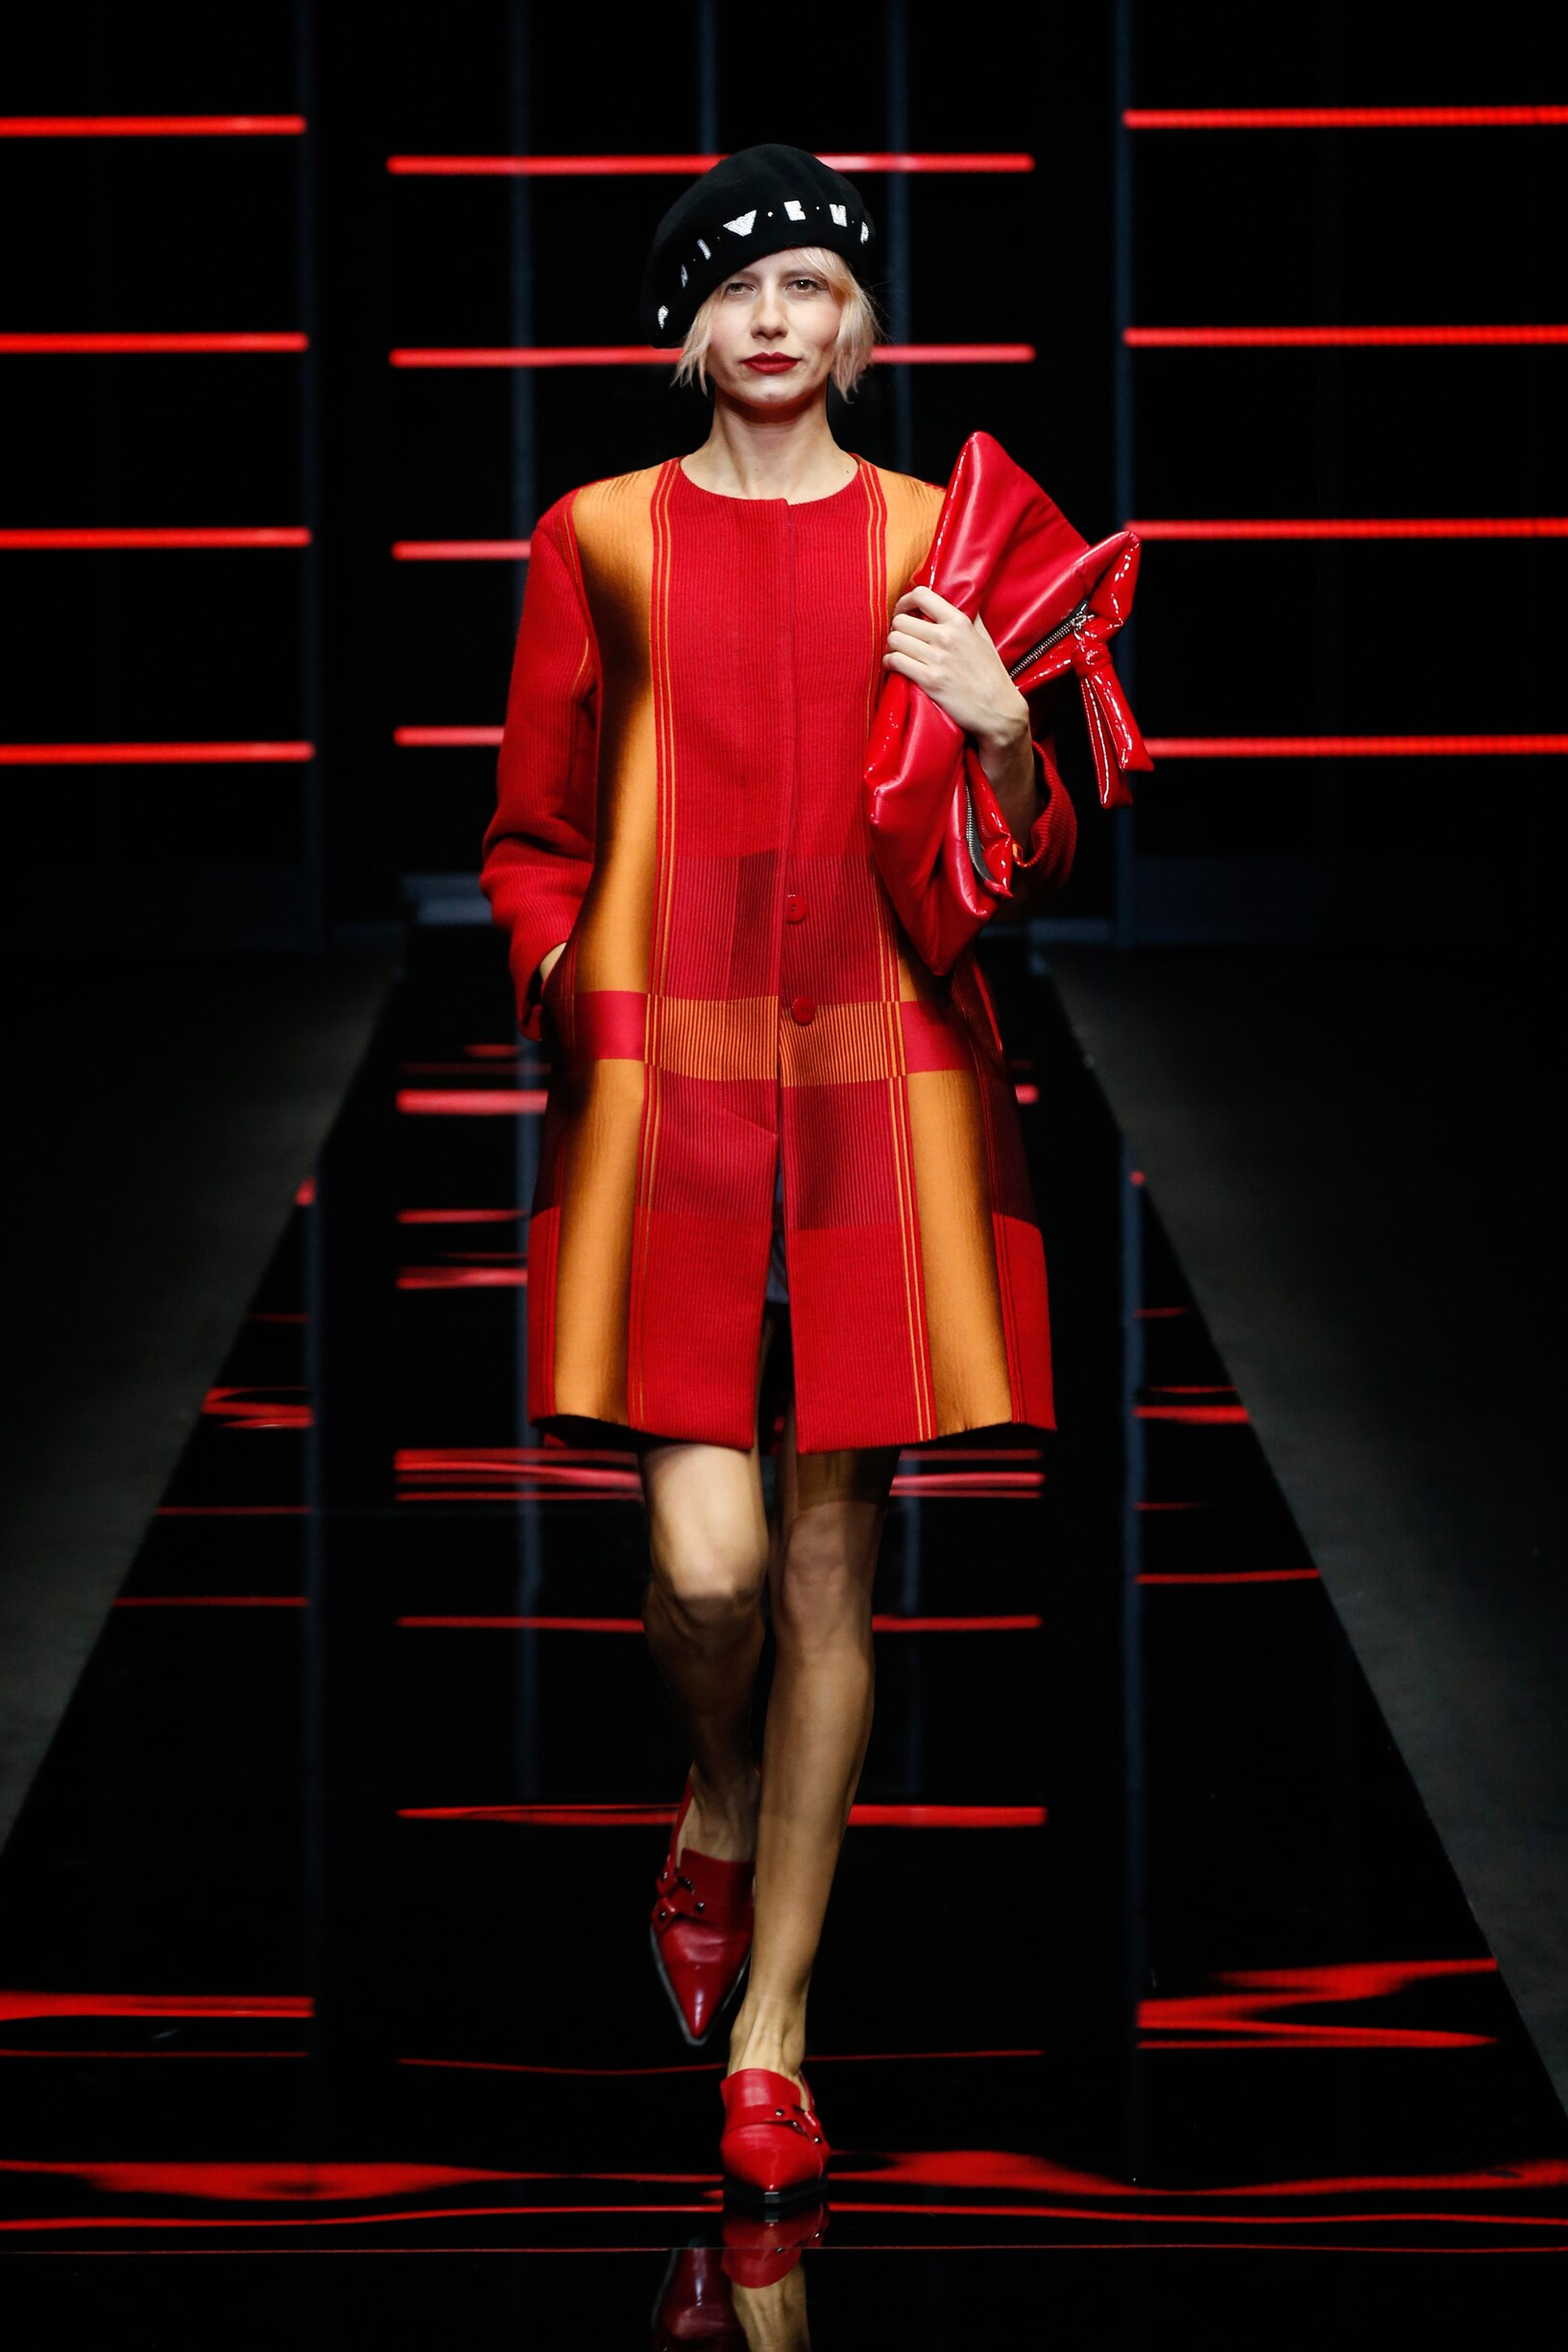 FW 2019-20 Emporio Armani Fashion Show